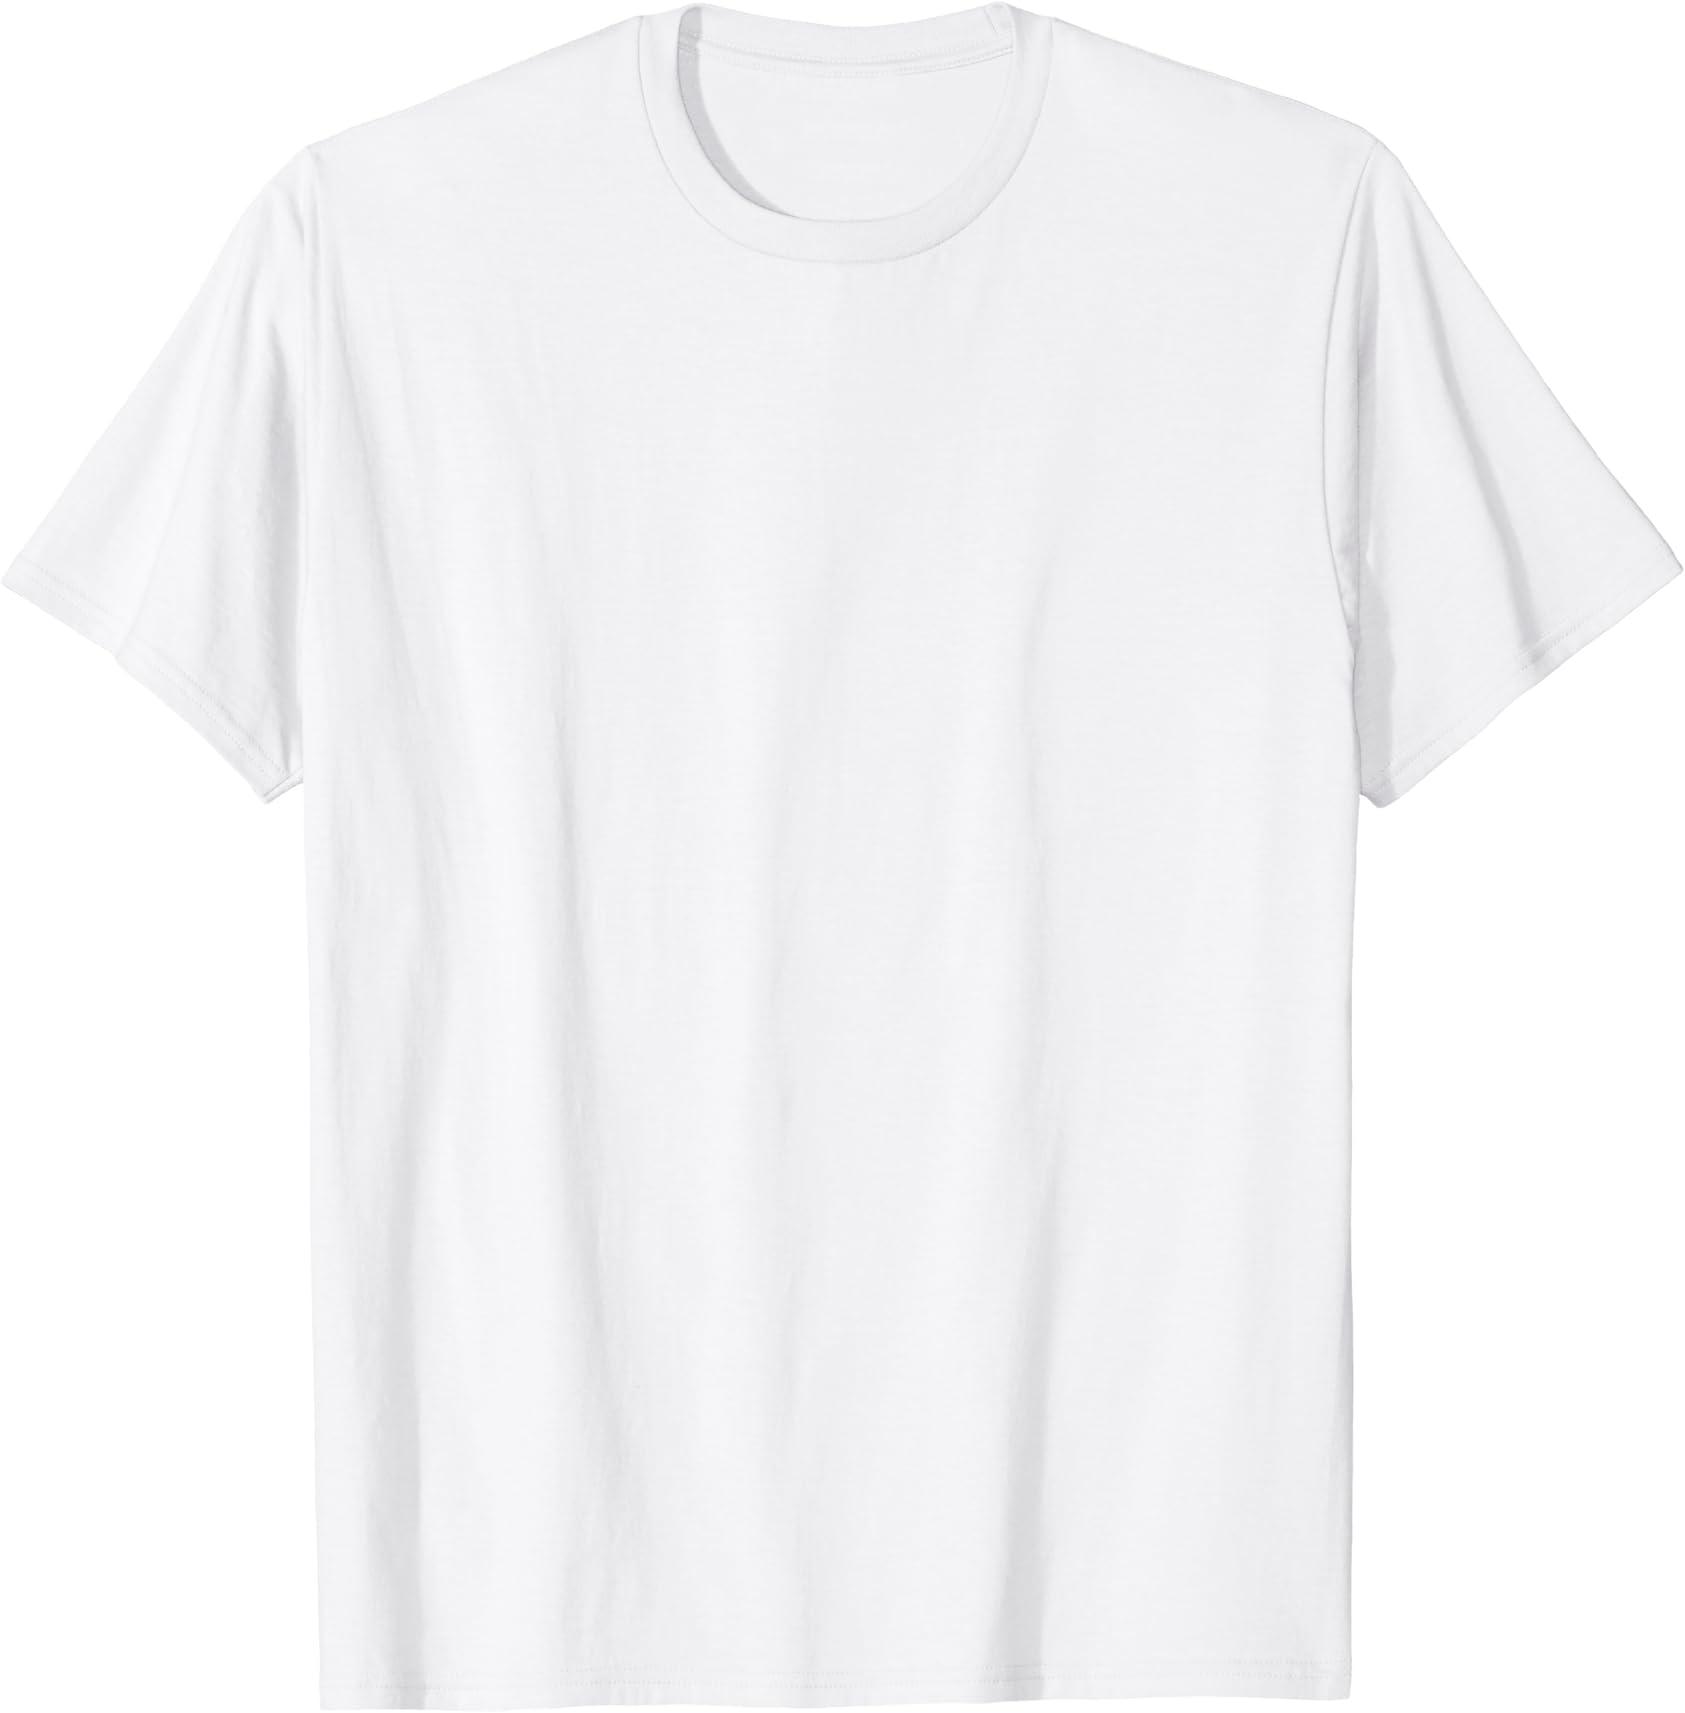 when i woke Trust me Womens funny t-shirt slogan tee sarcasm ladies sarcastic